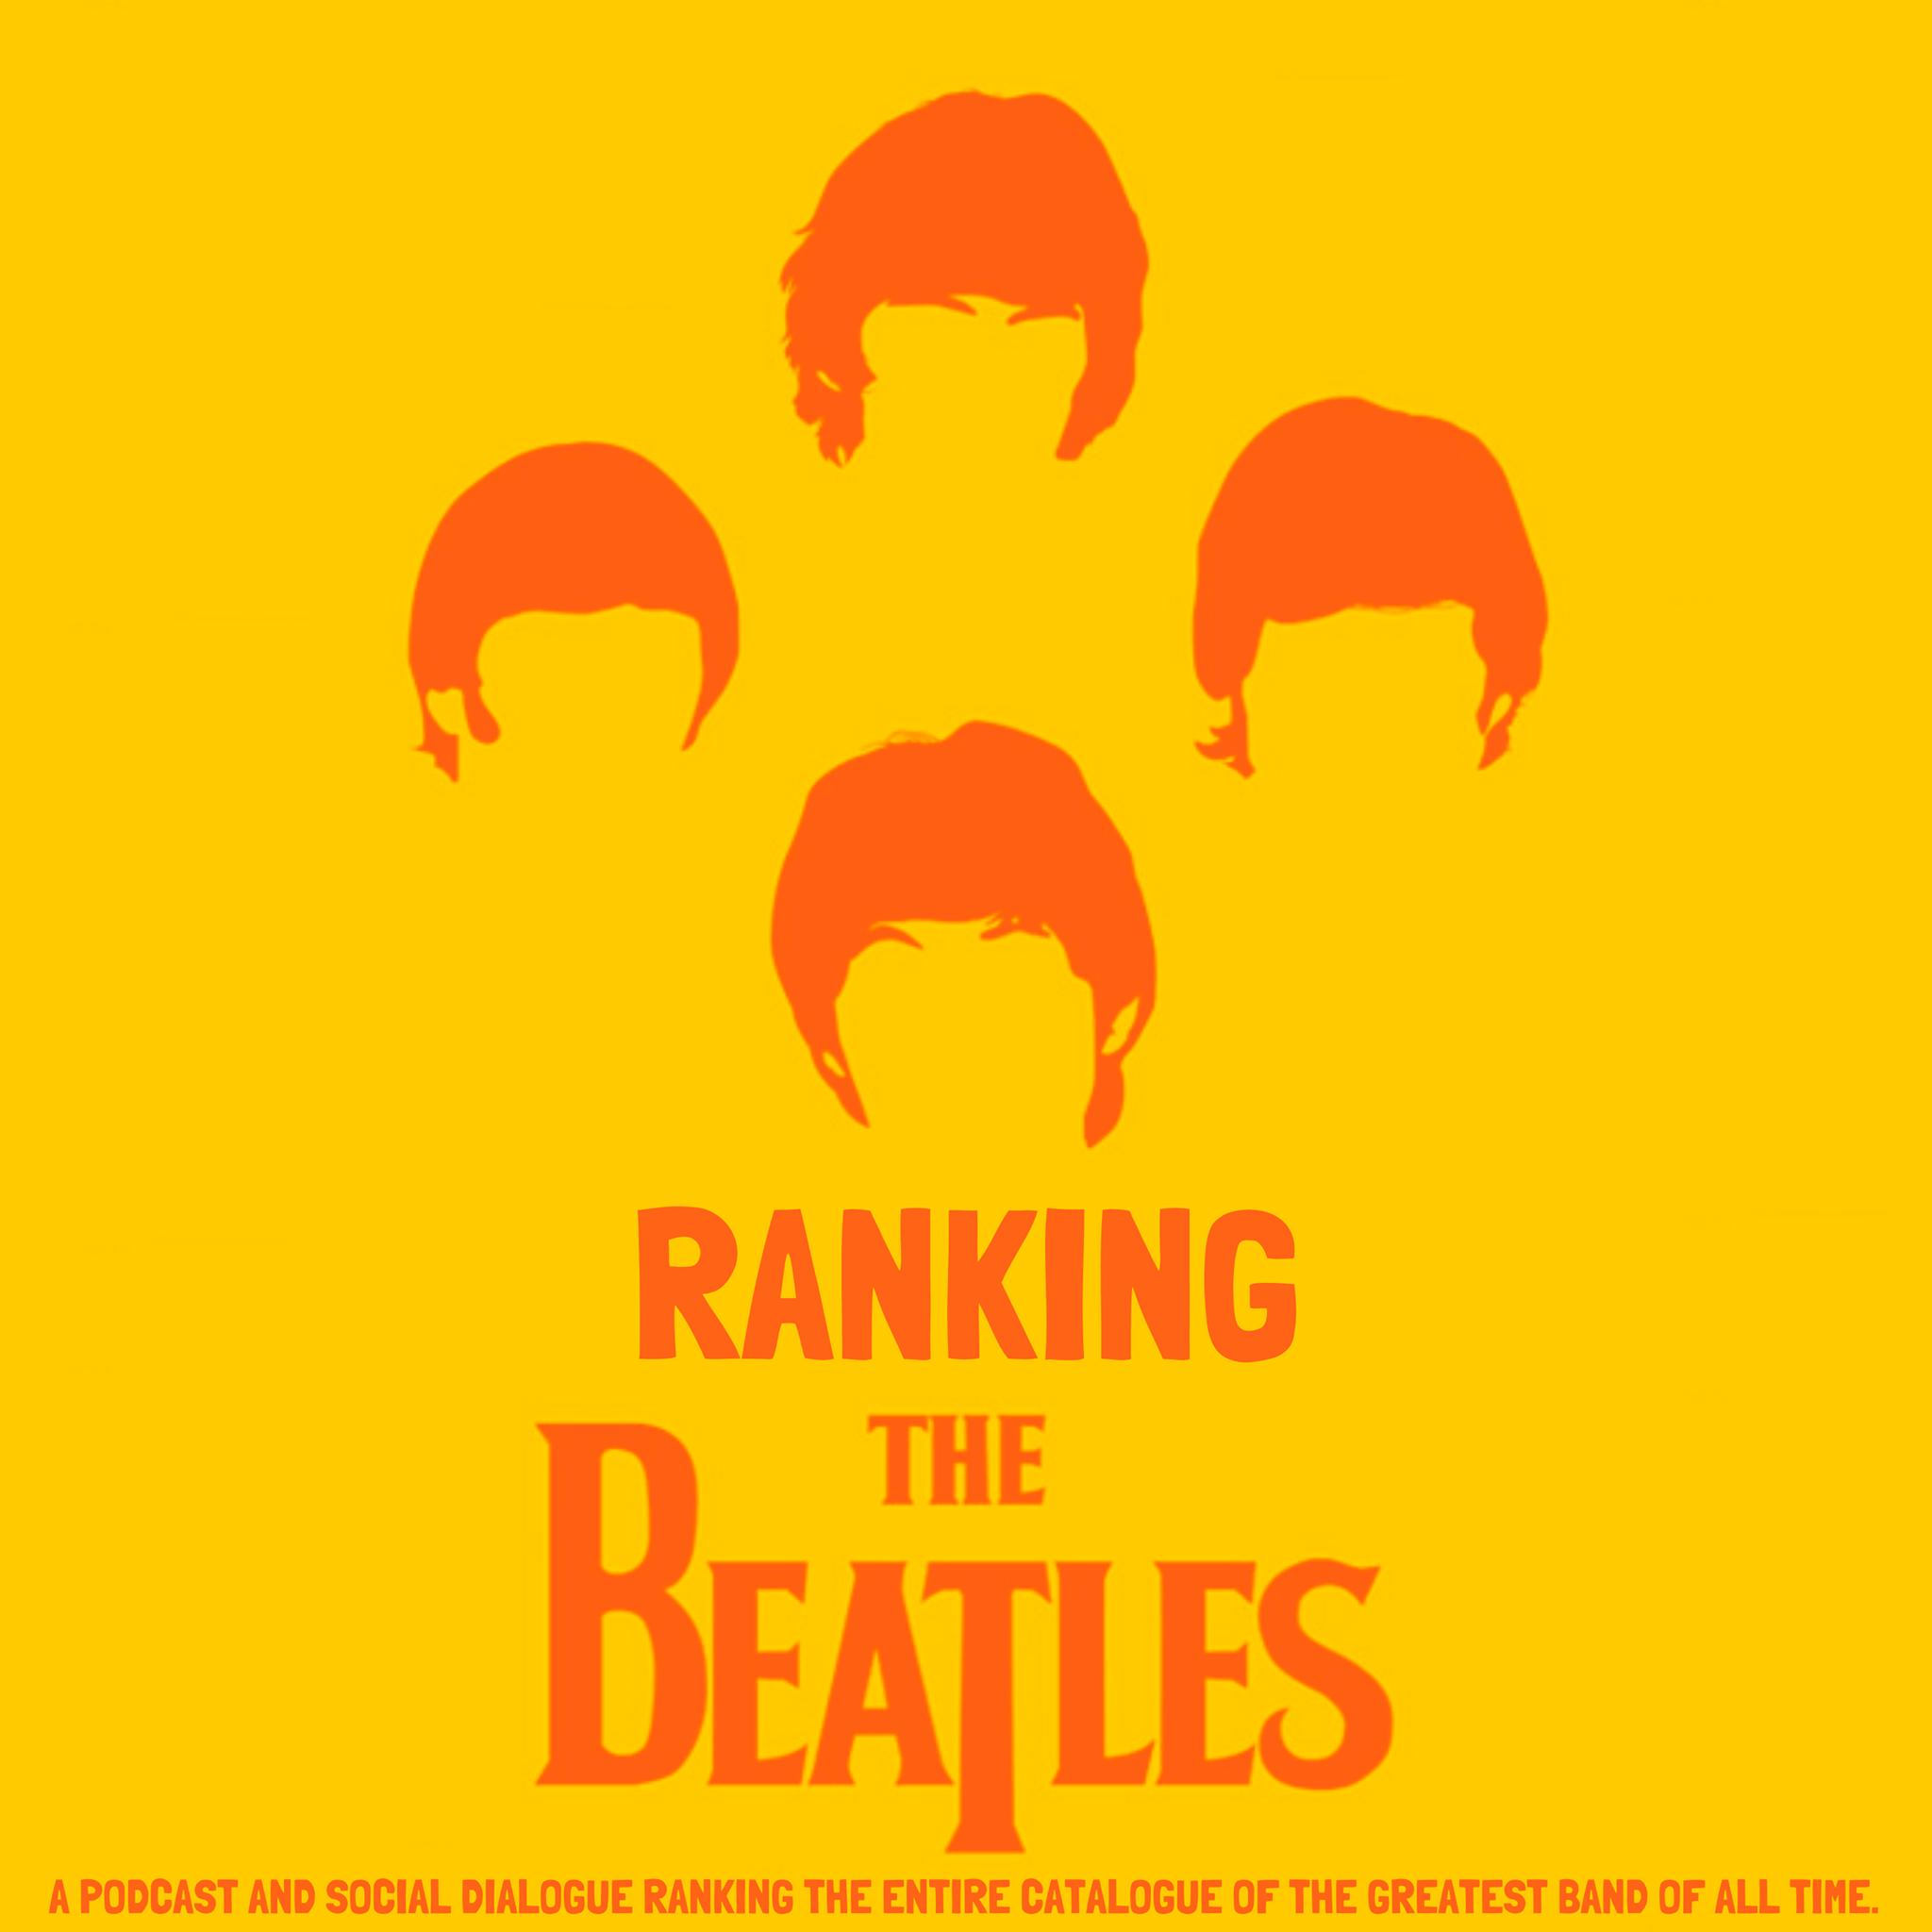 Ranking The Beatles (rankingthebeatles) Profile Image | Linktree